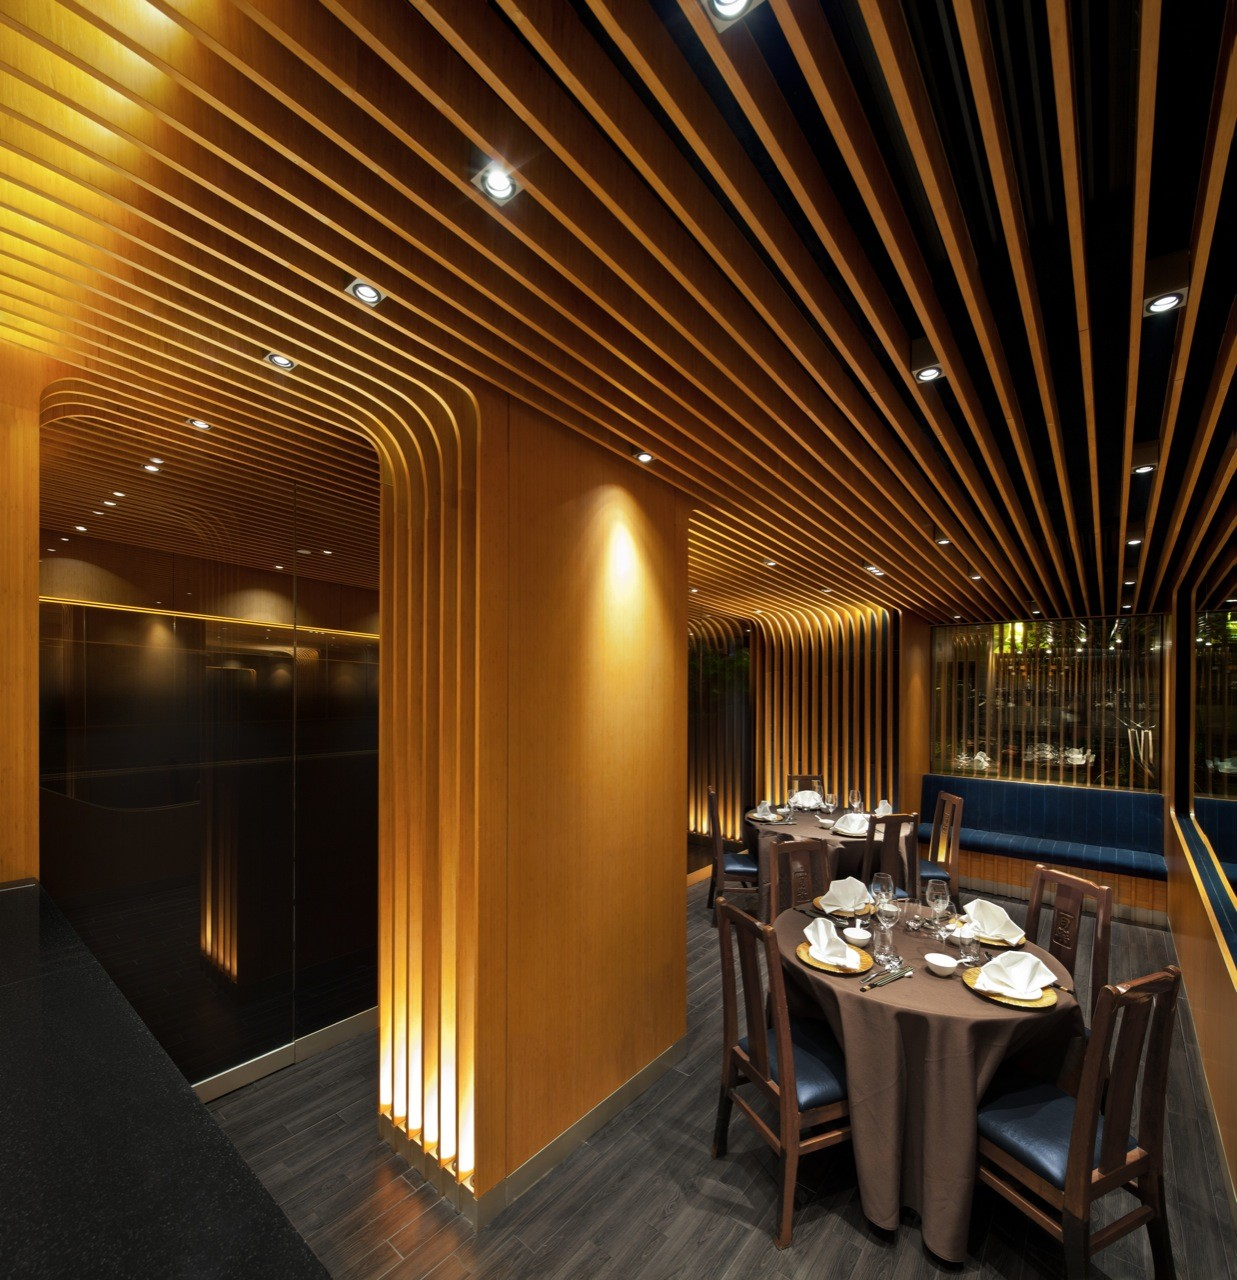 Home Design Ideas Hong Kong: Gallery Of Pak Loh Chiu Chow Restaurant / LEAD